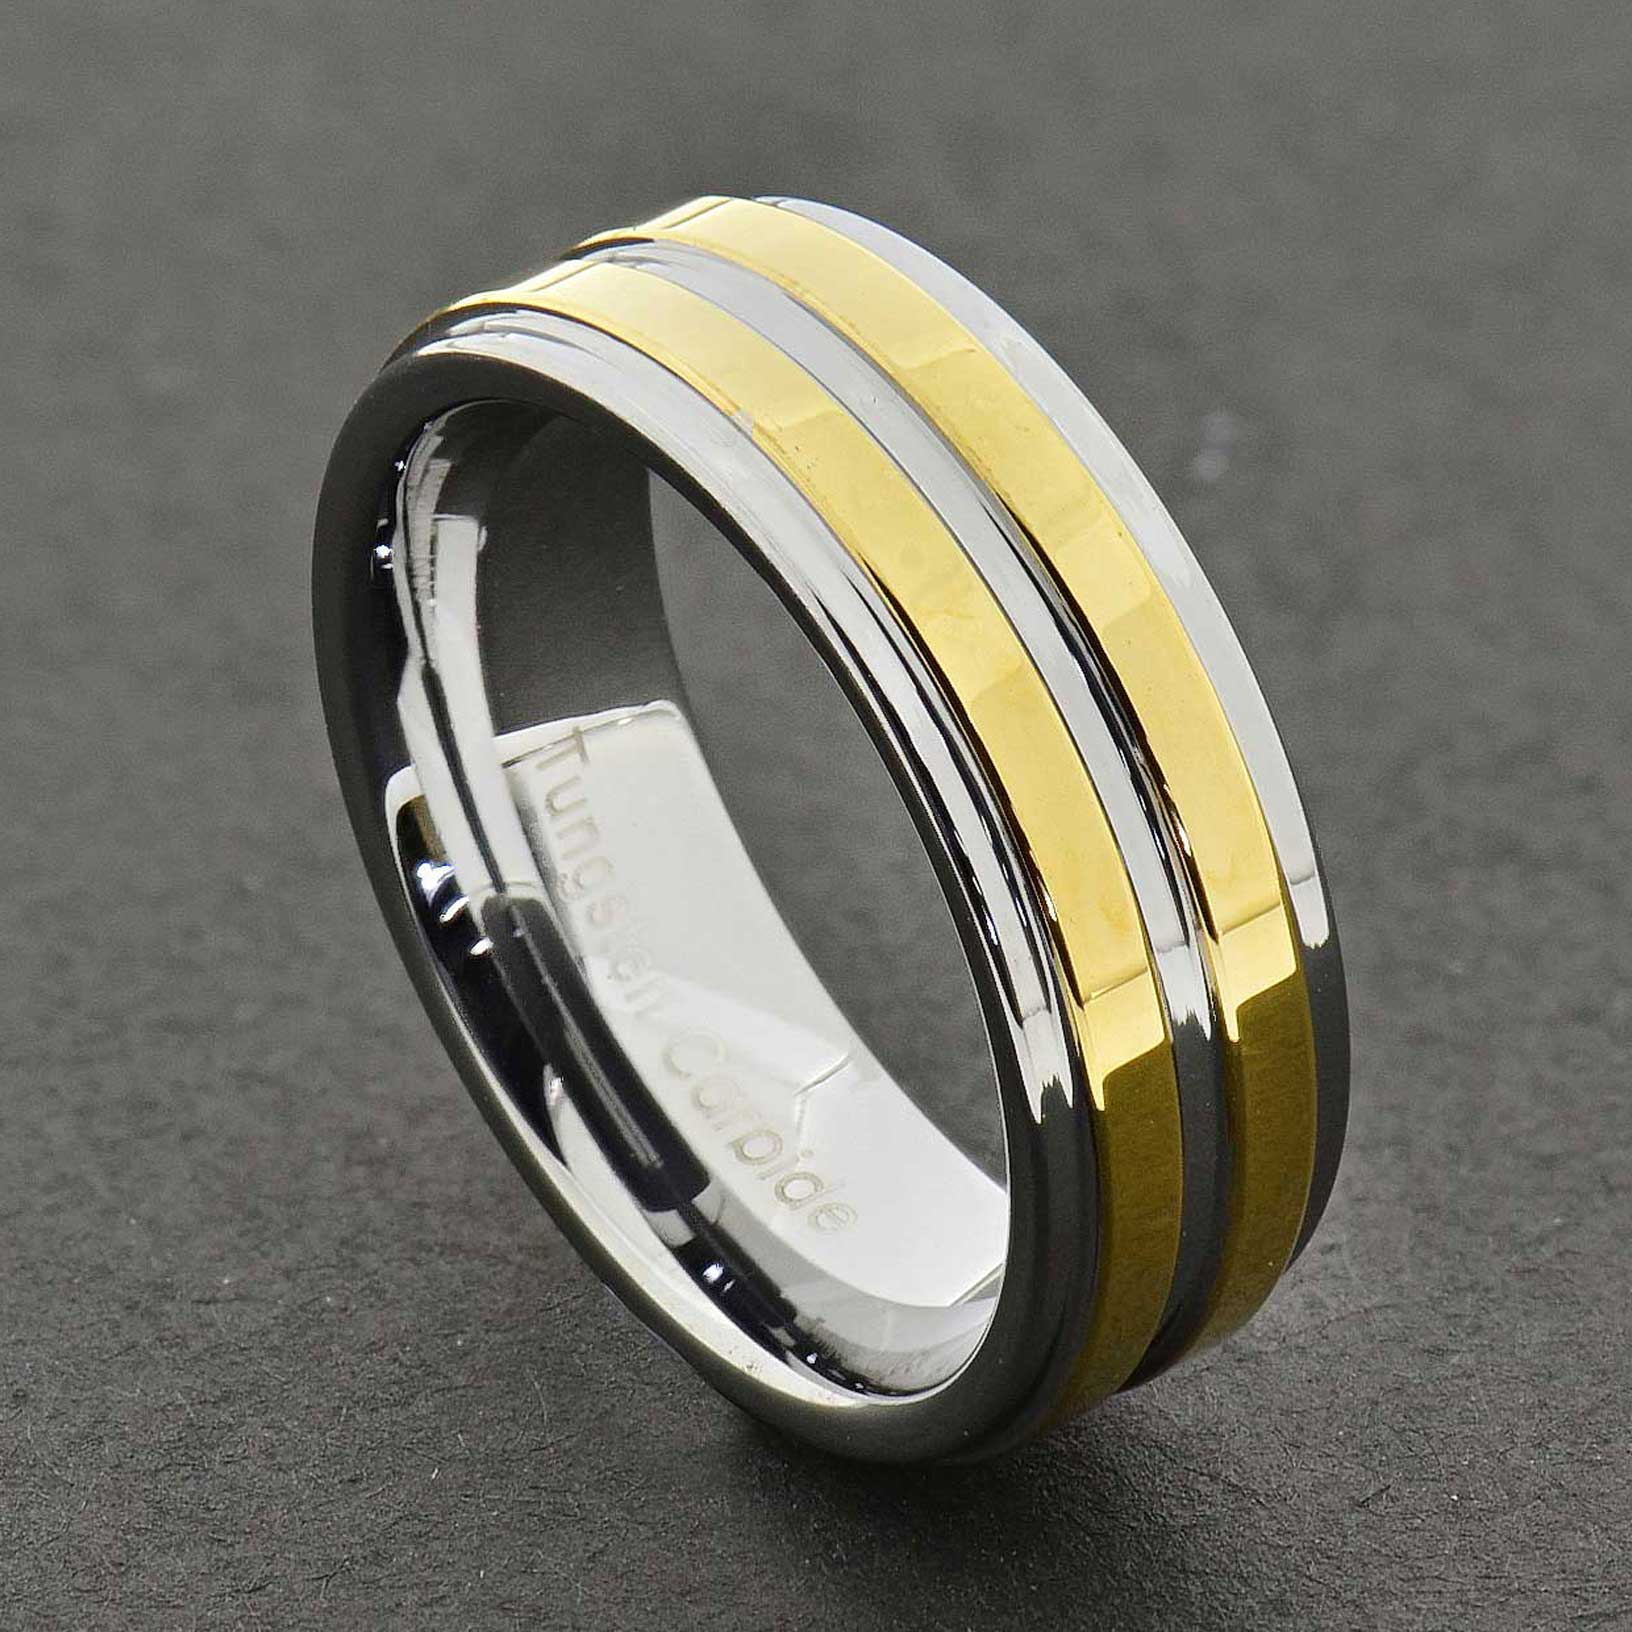 8mm dome 18k gold mens tungsten ring wedding band bridal. Black Bedroom Furniture Sets. Home Design Ideas